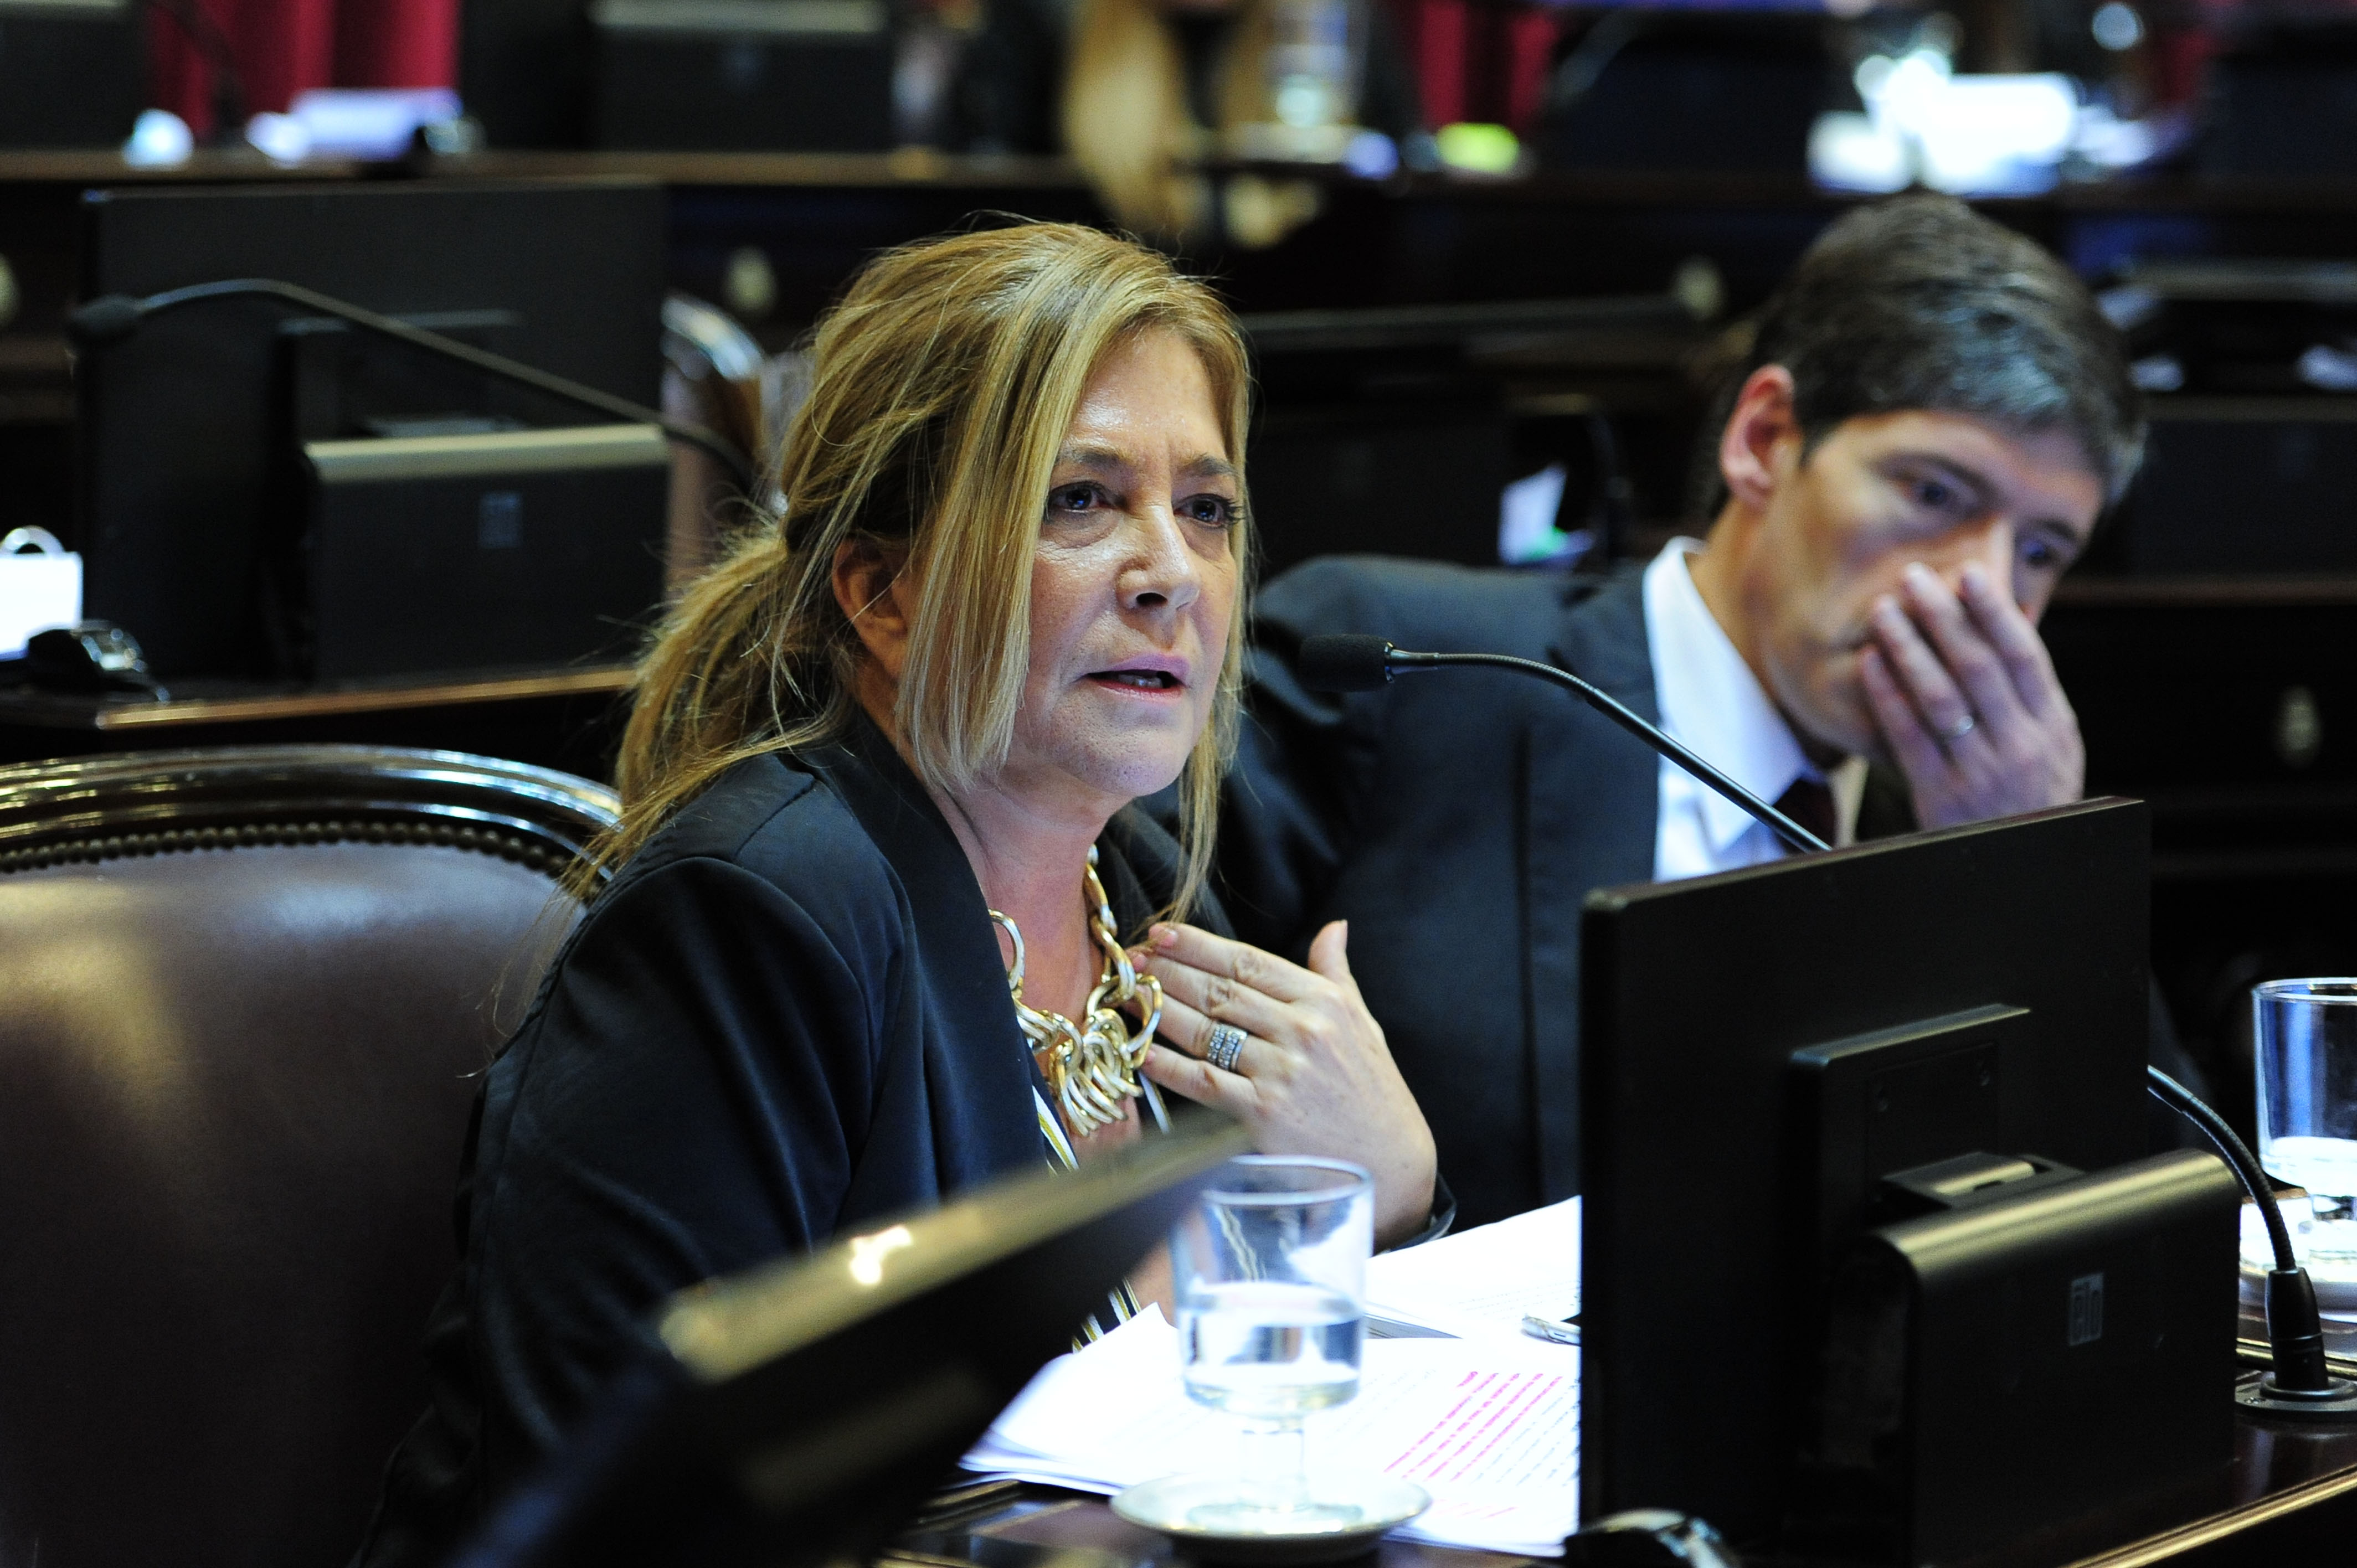 La c mara de senadores repudi las declaraciones de for La camara de senadores